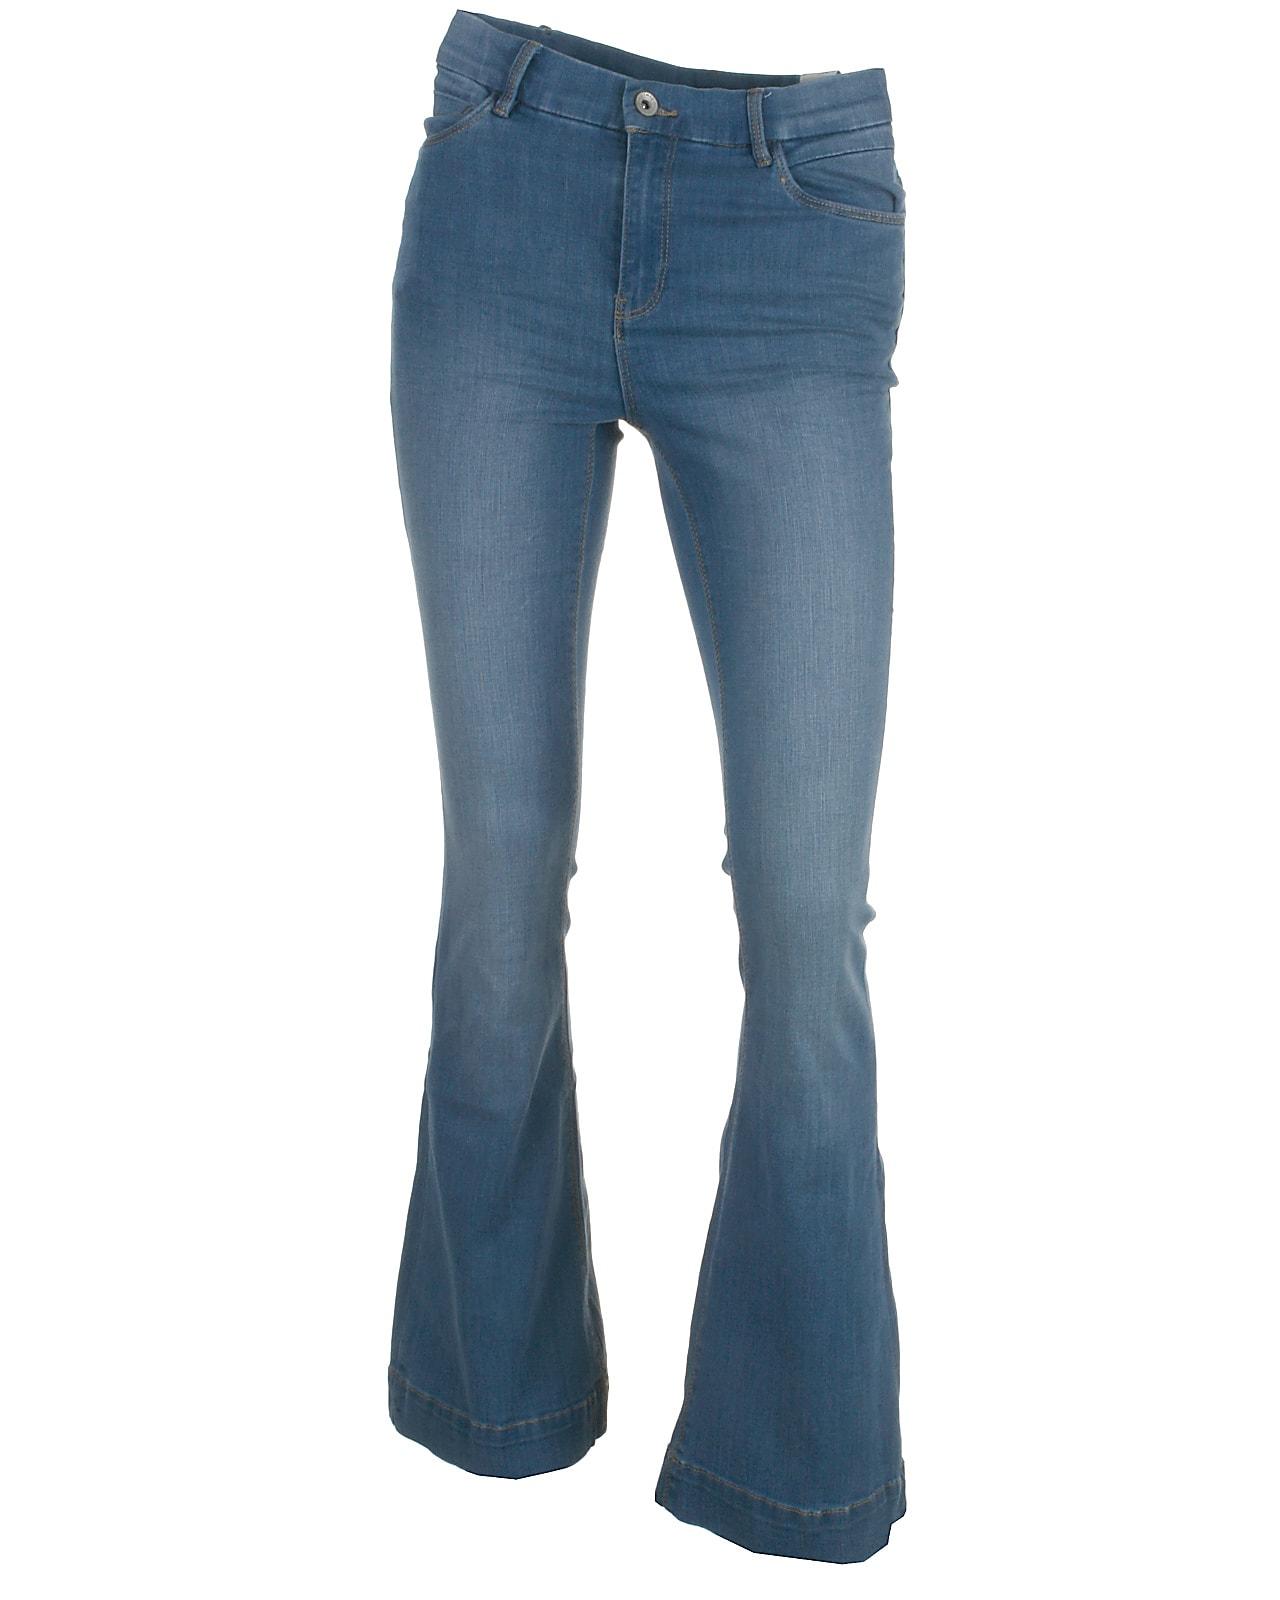 Image of LMTD boot pant, Pil, mediumblue